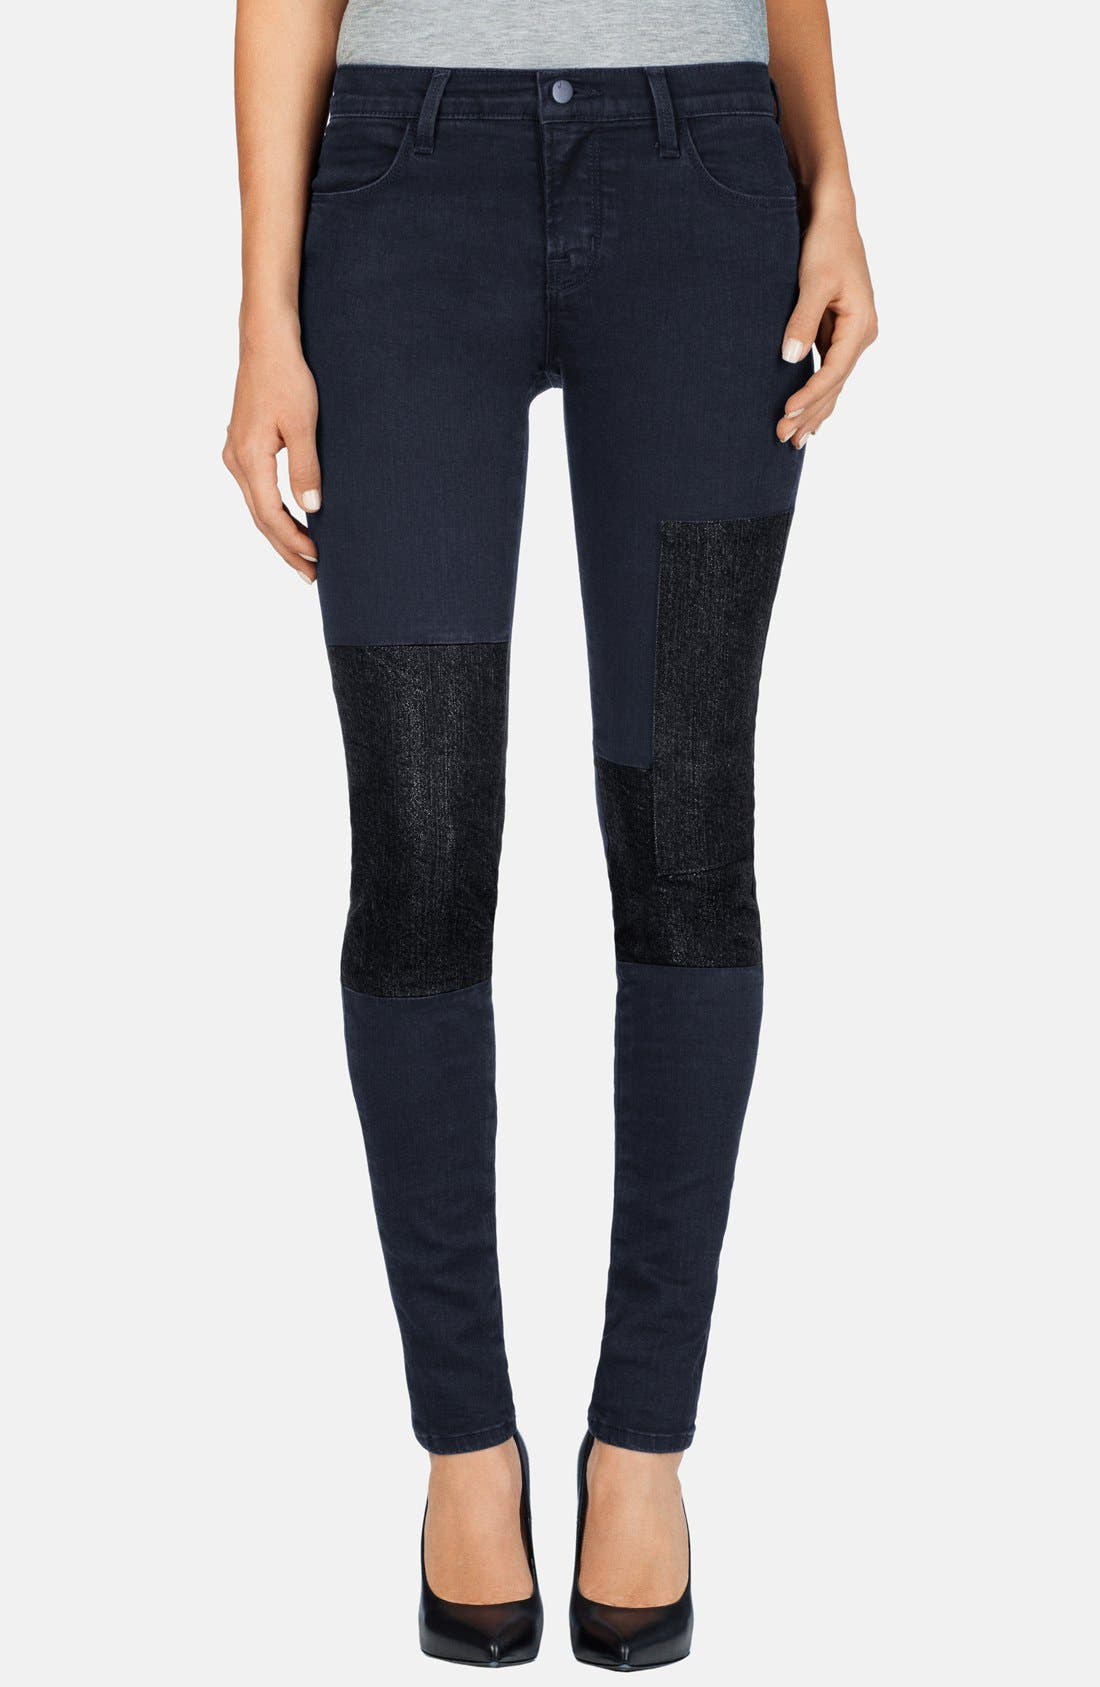 Main Image - J Brand 'Nova' Paneled Skinny Jeans (Bluebird)